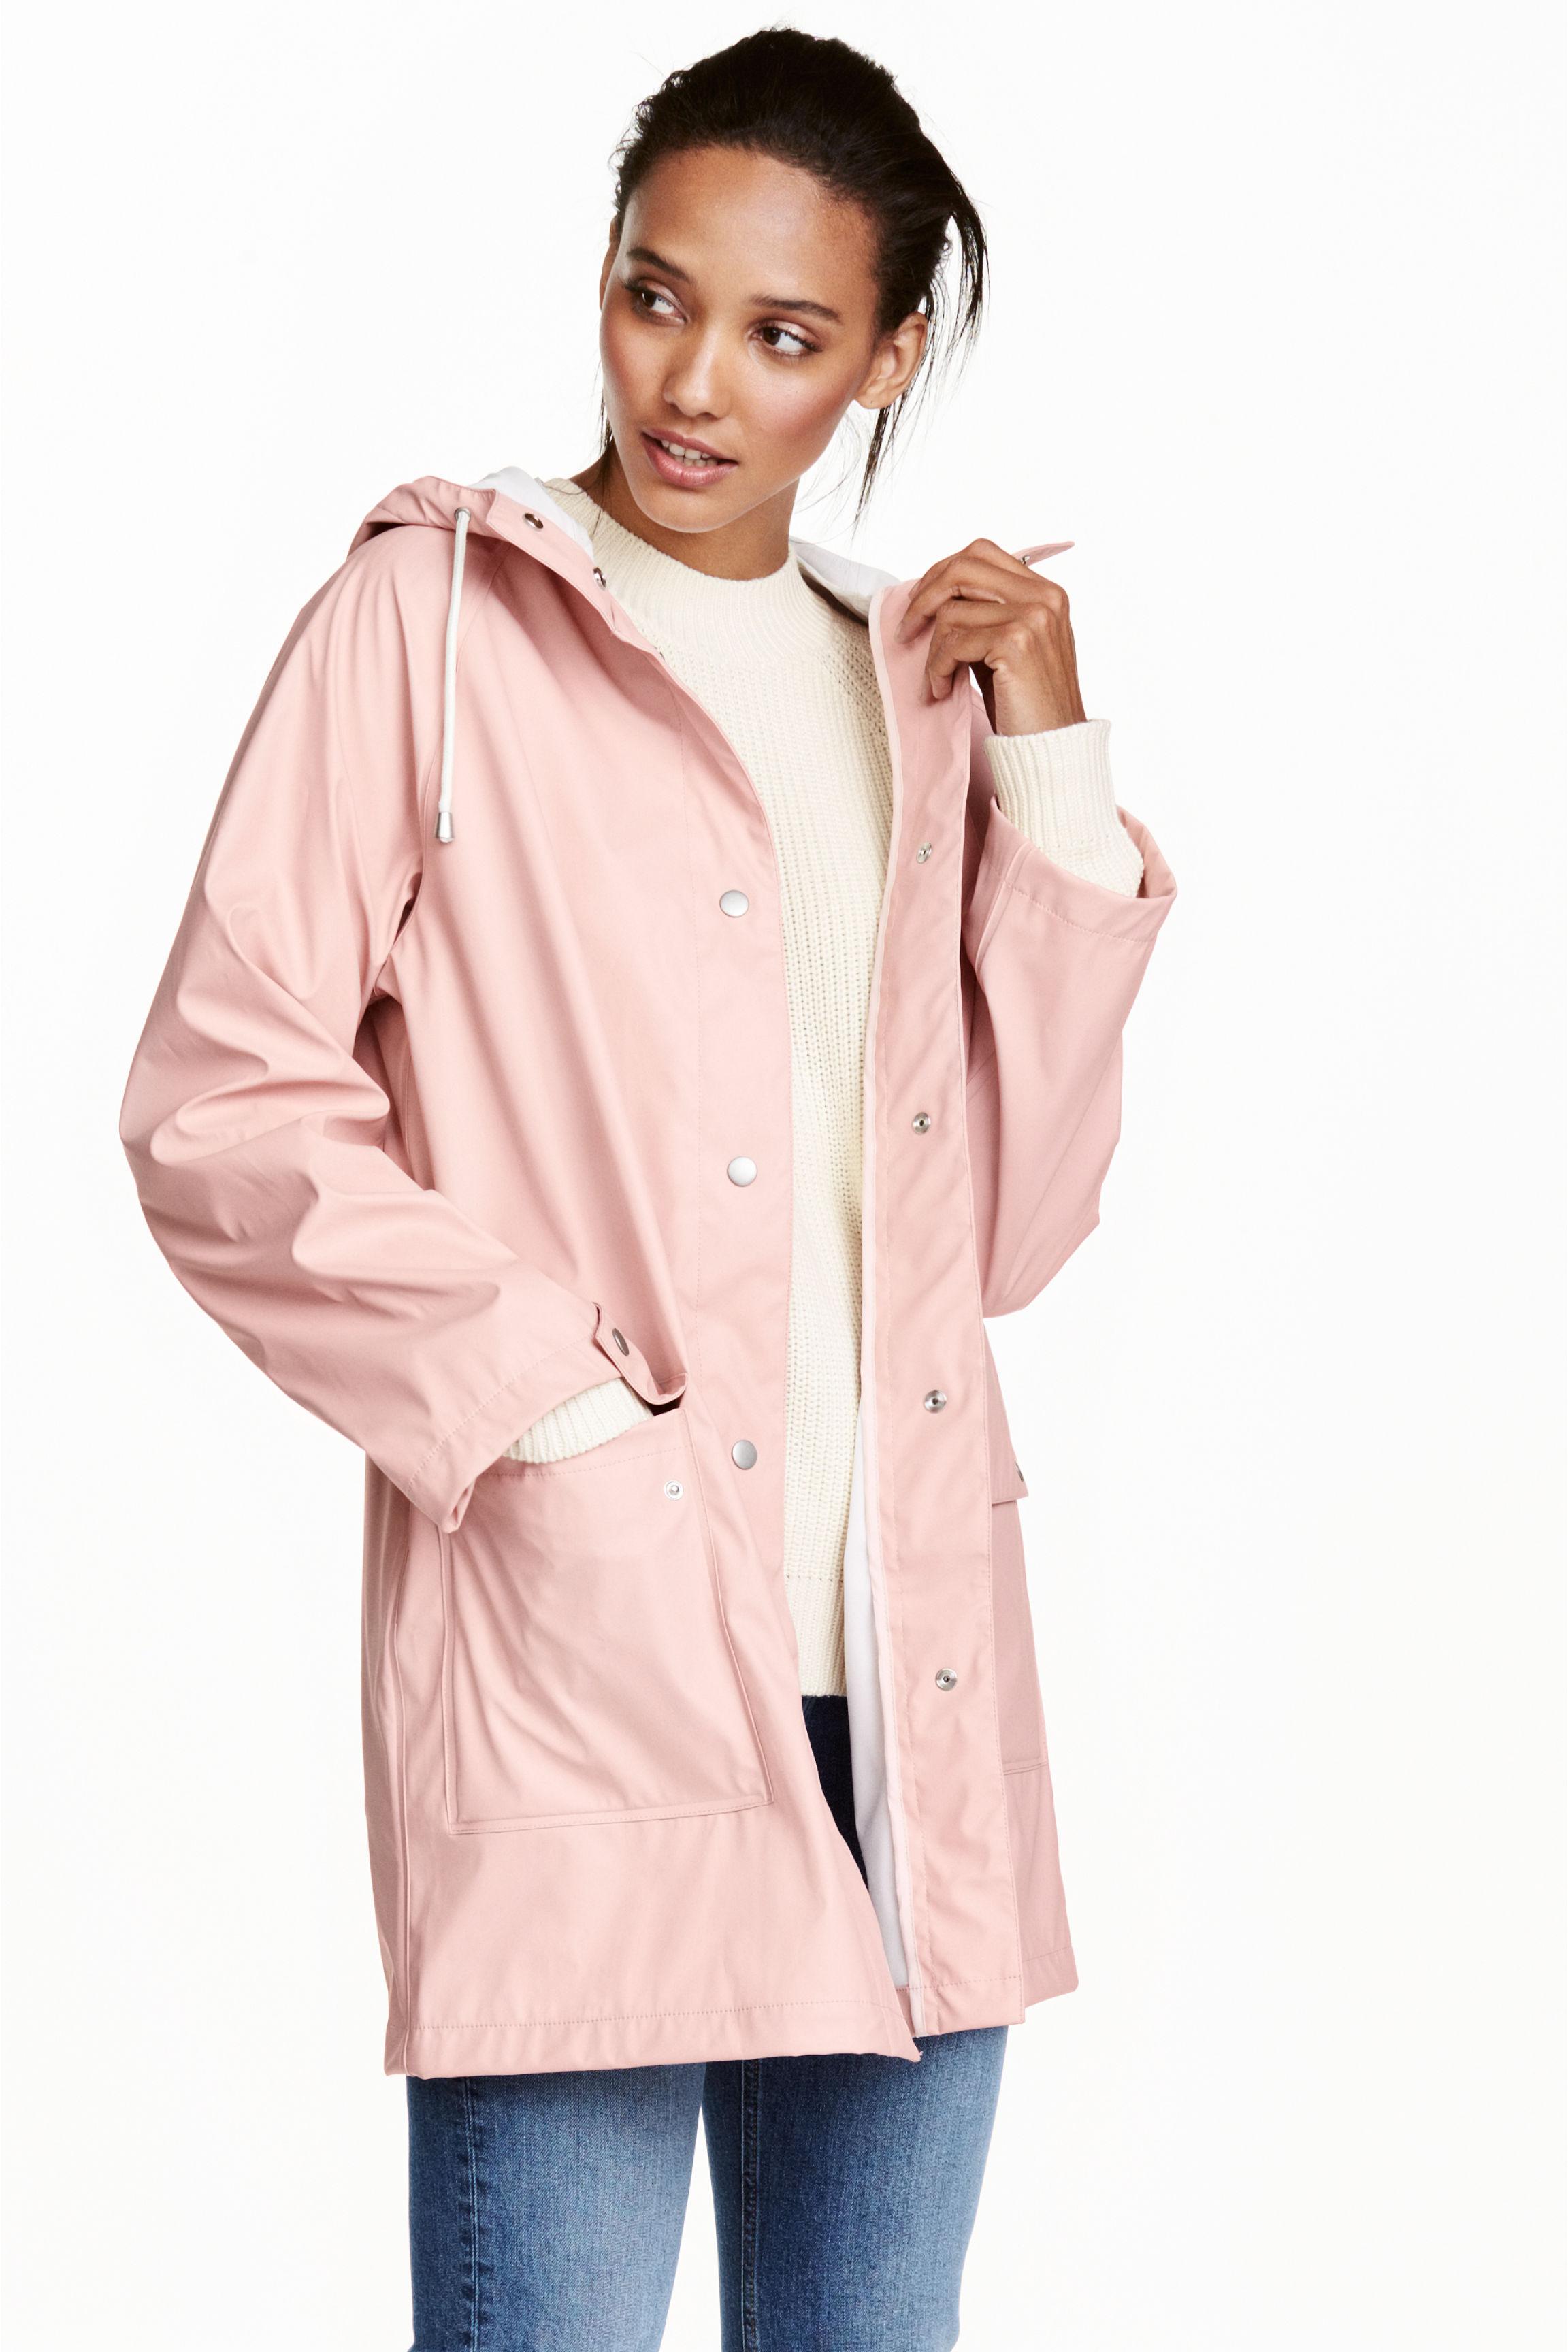 Women's Coats- Shop the latest trends online | H&M GB